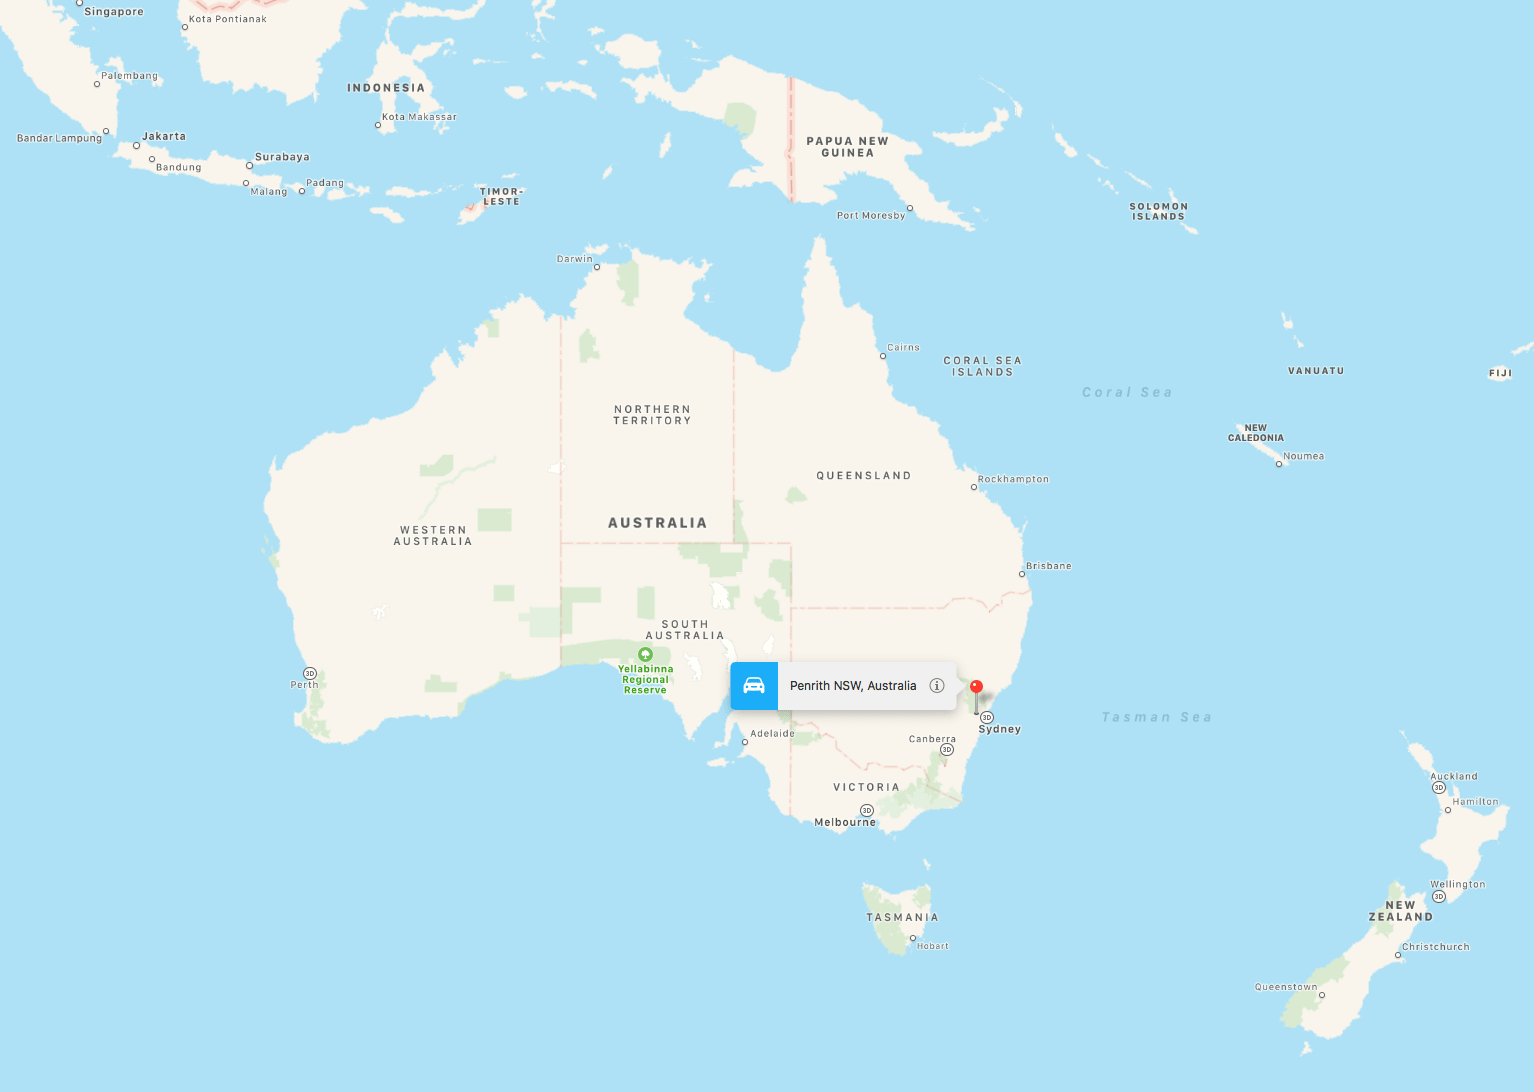 australia, indoor ski